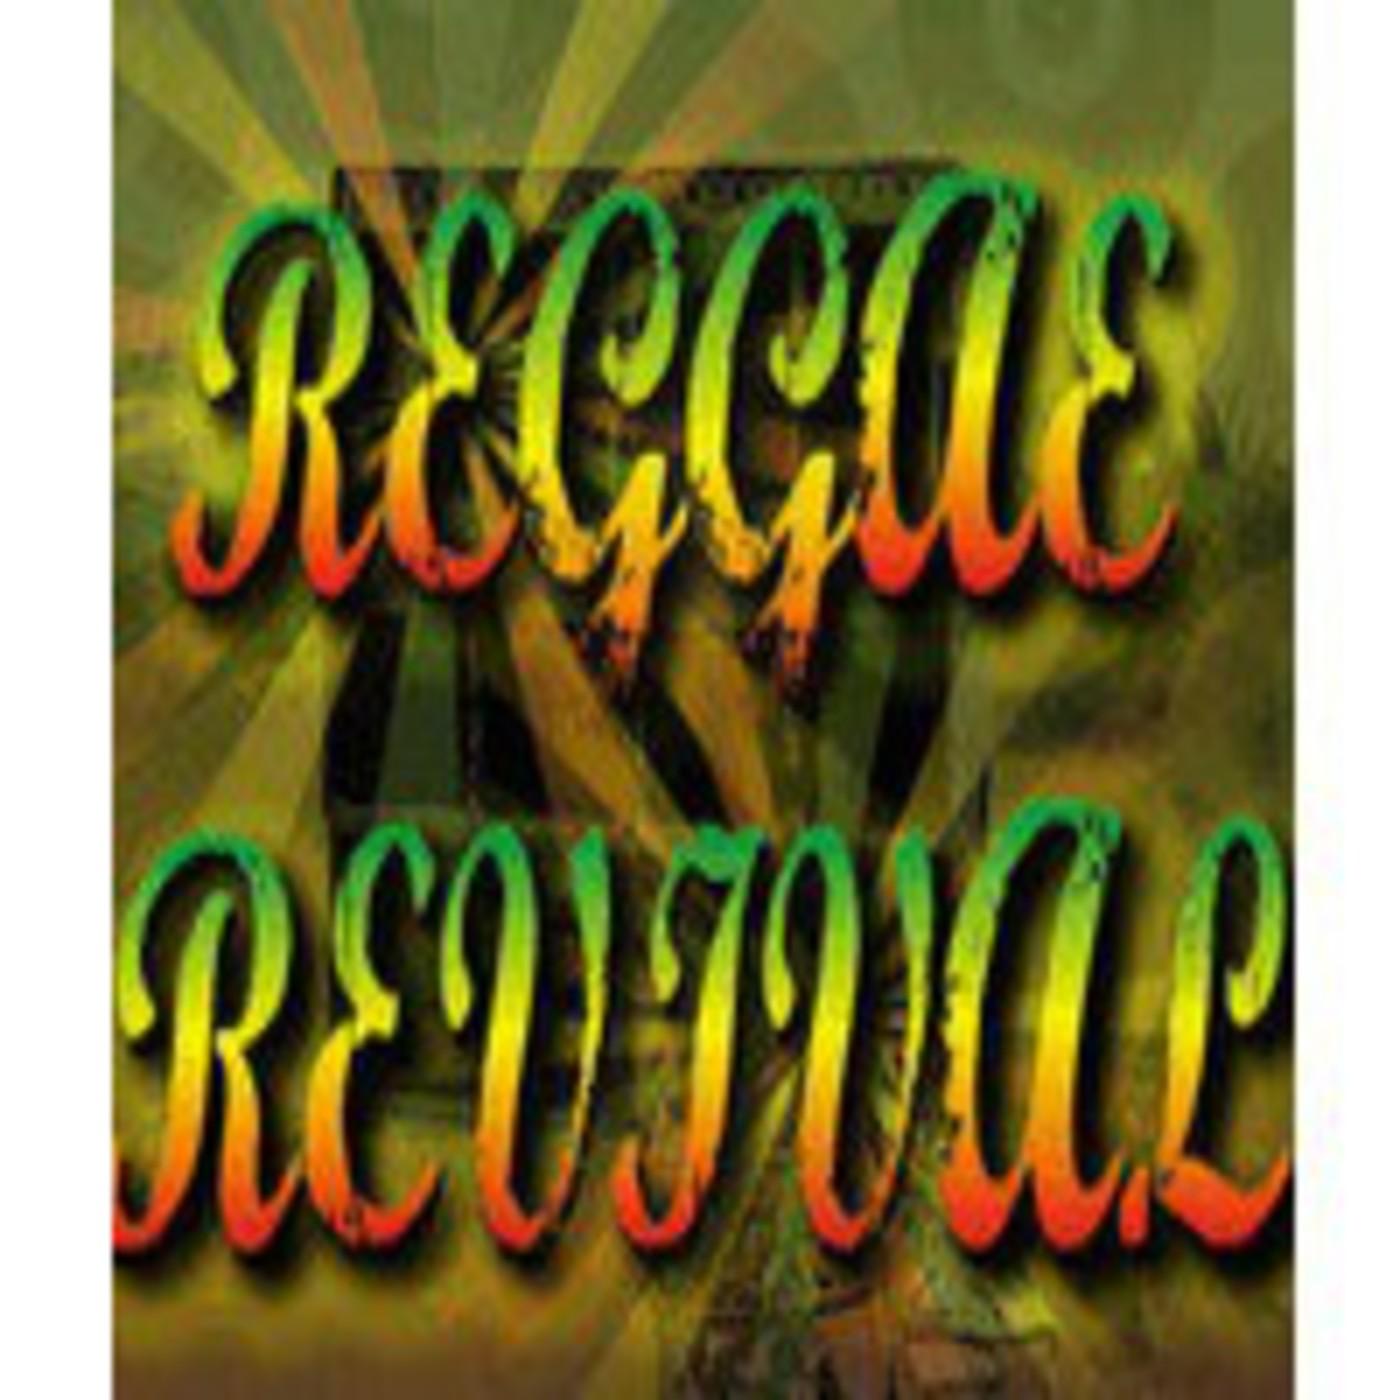 Reggae Revival 7/1/11